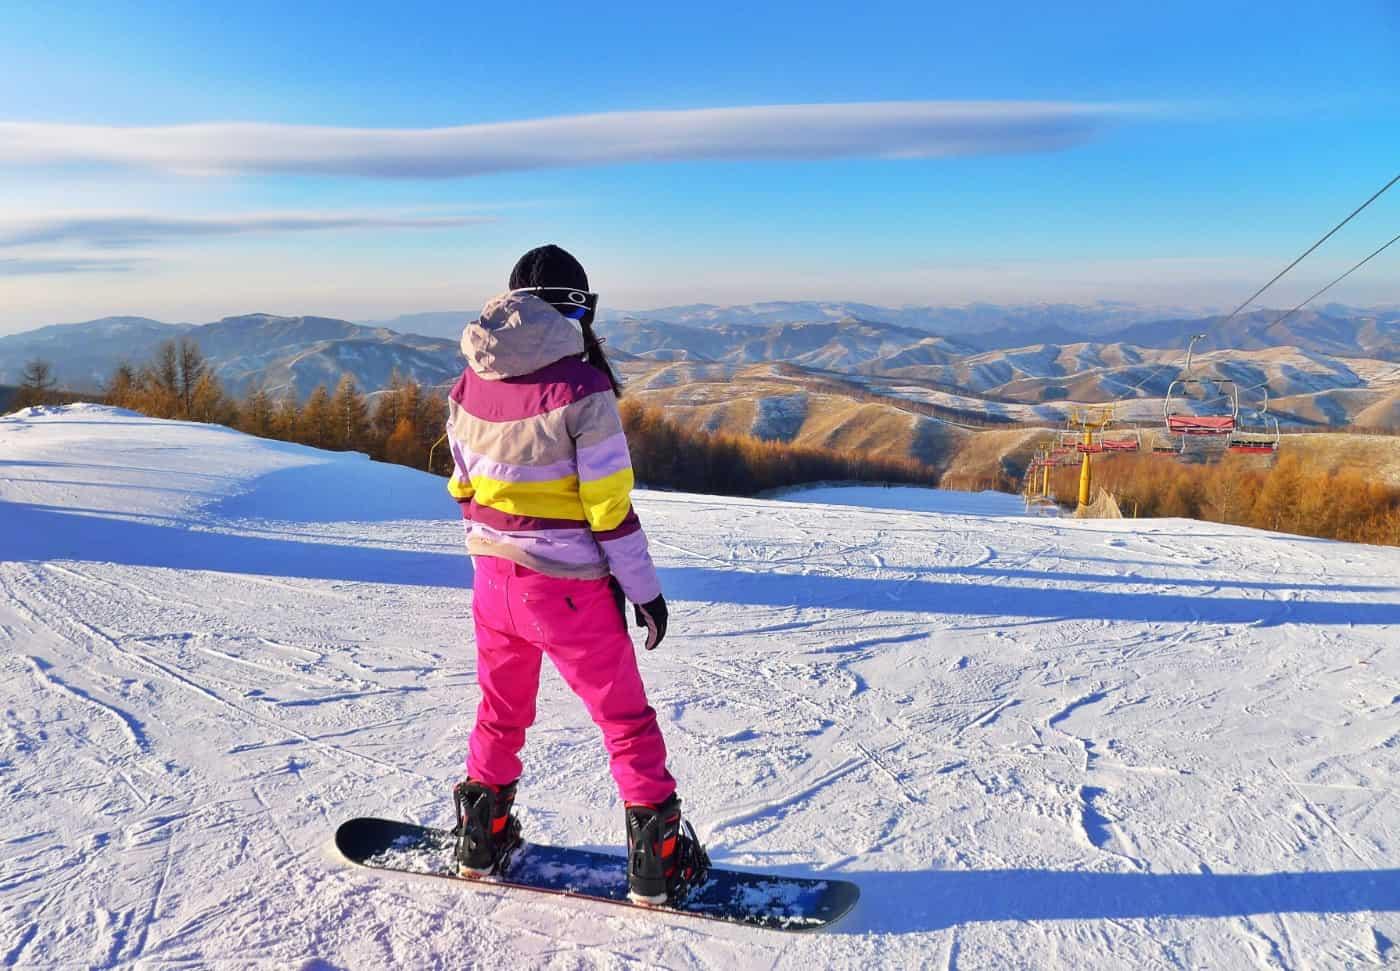 Is Snowboarding and Skateboarding Similar